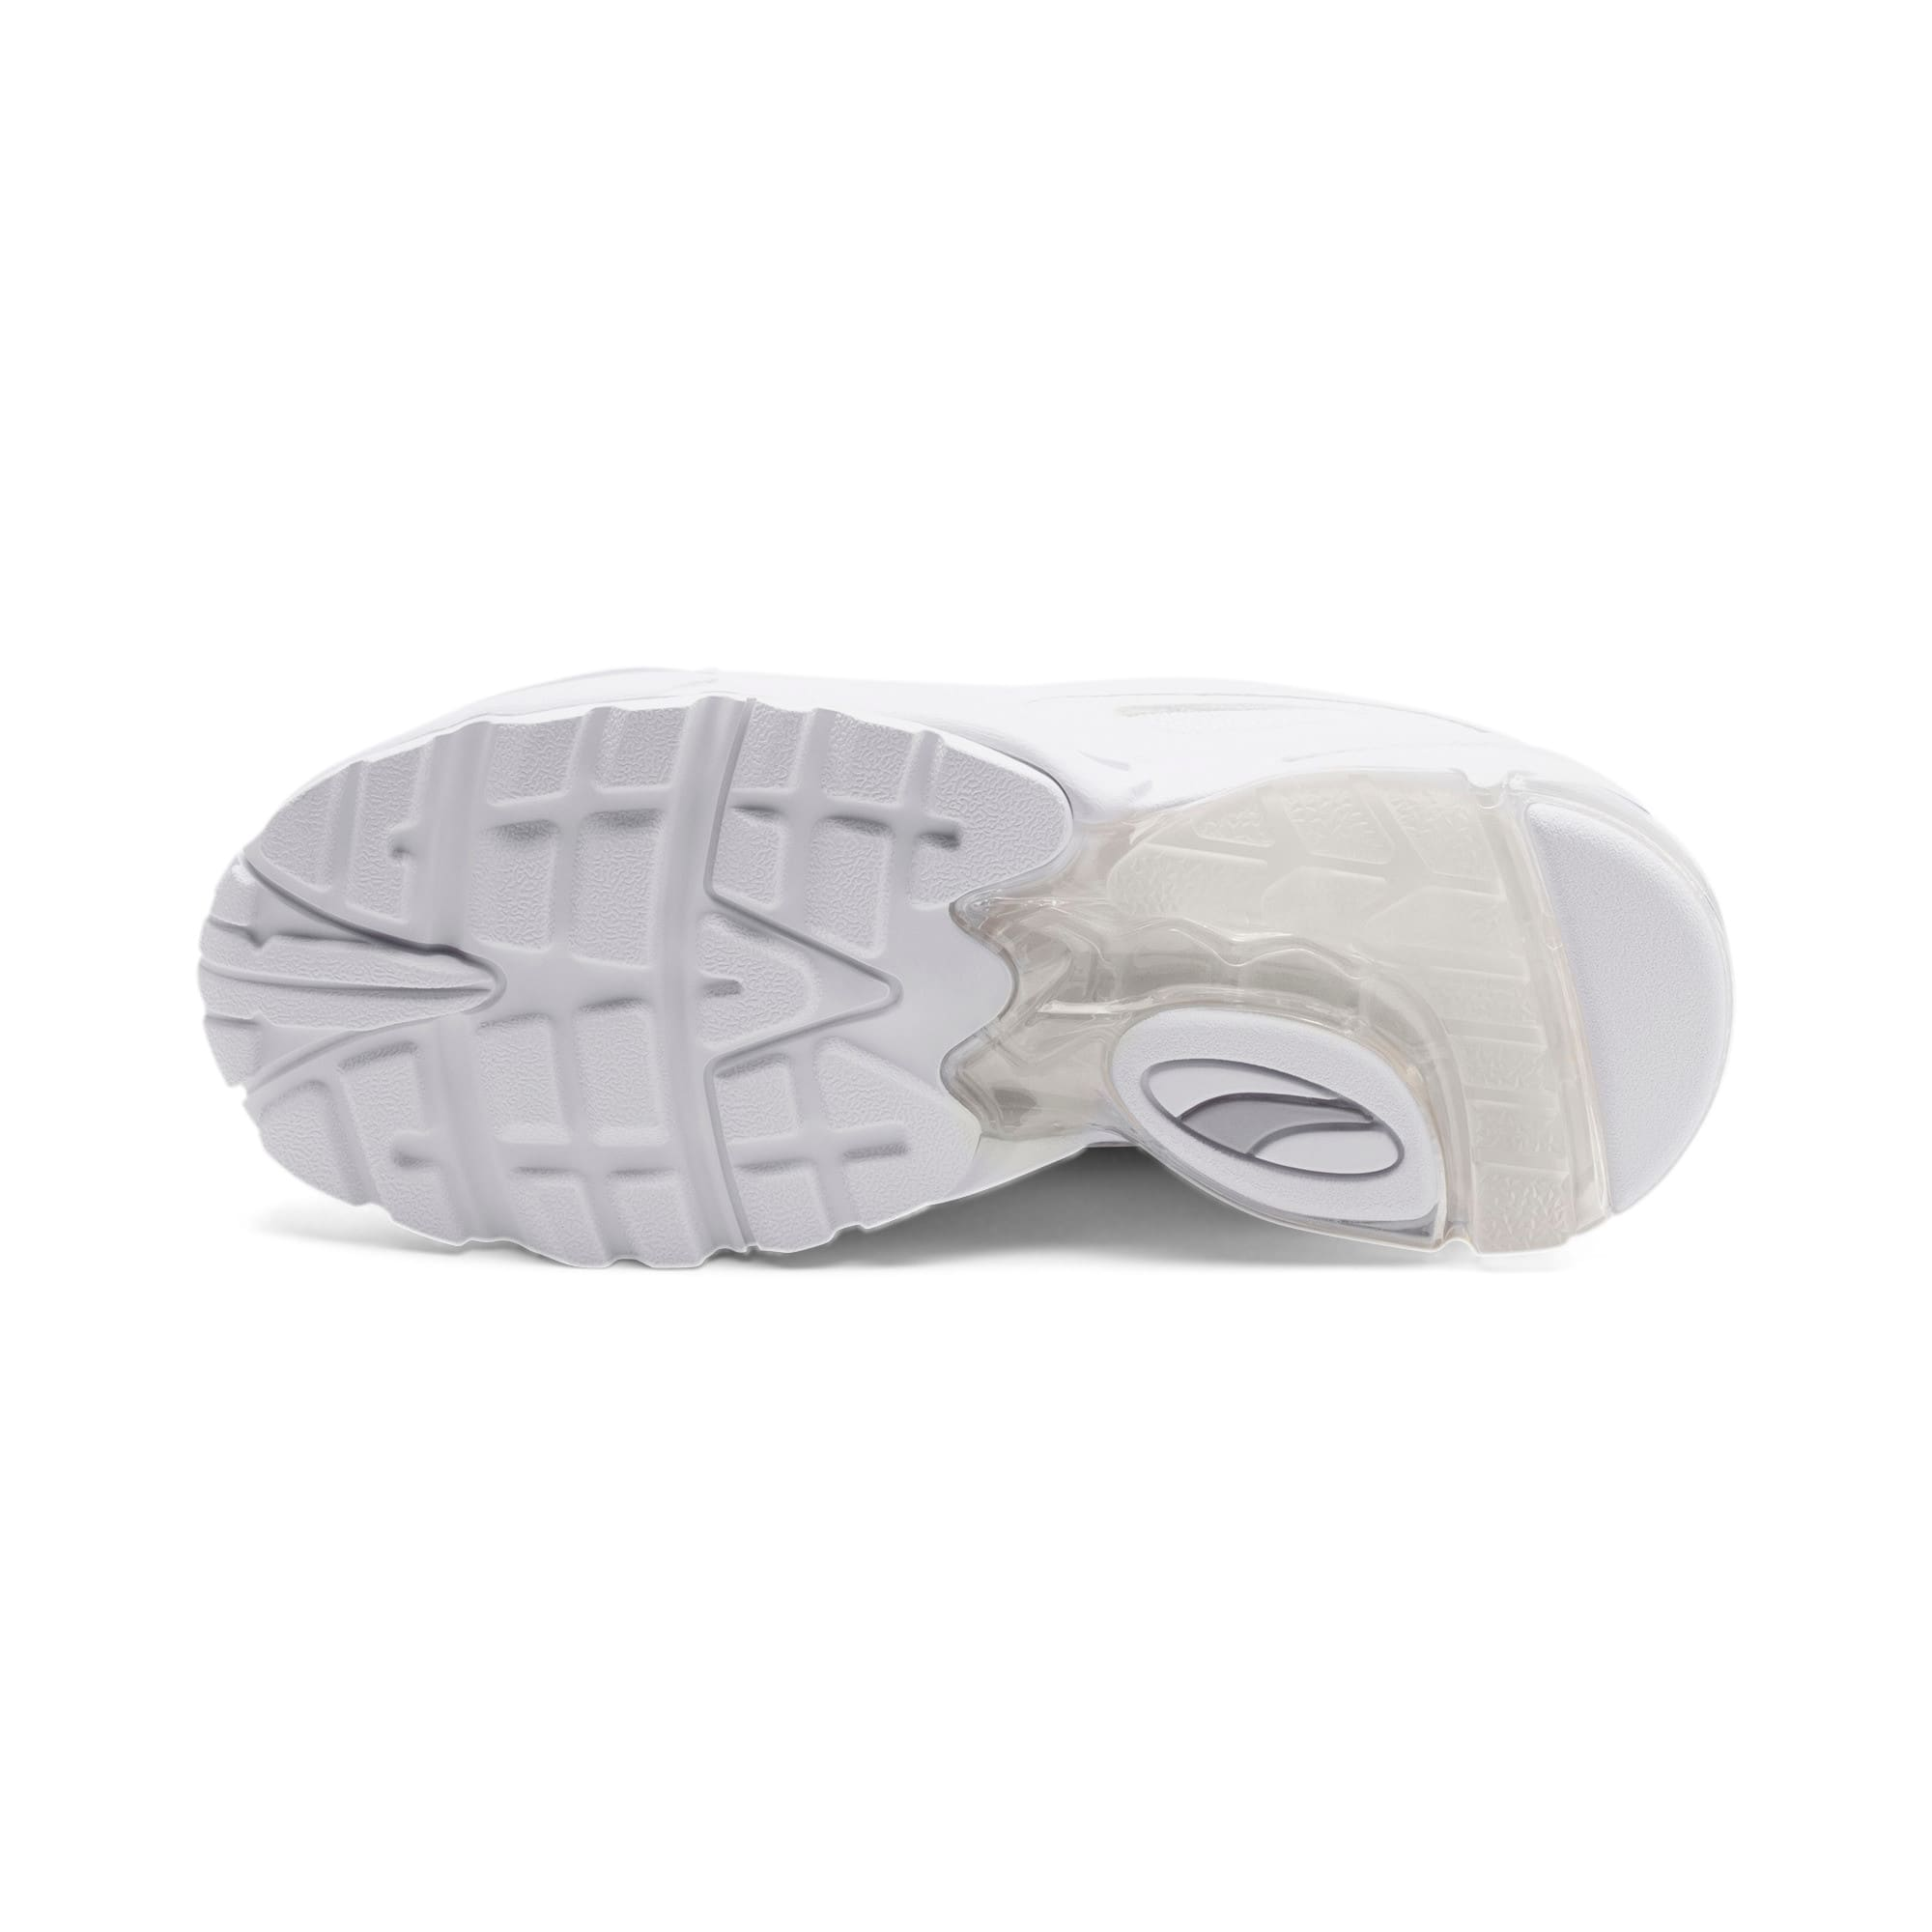 Imagen en miniatura 4 de Zapatillas de mujer CELL Stellar, Puma White-Silver, mediana